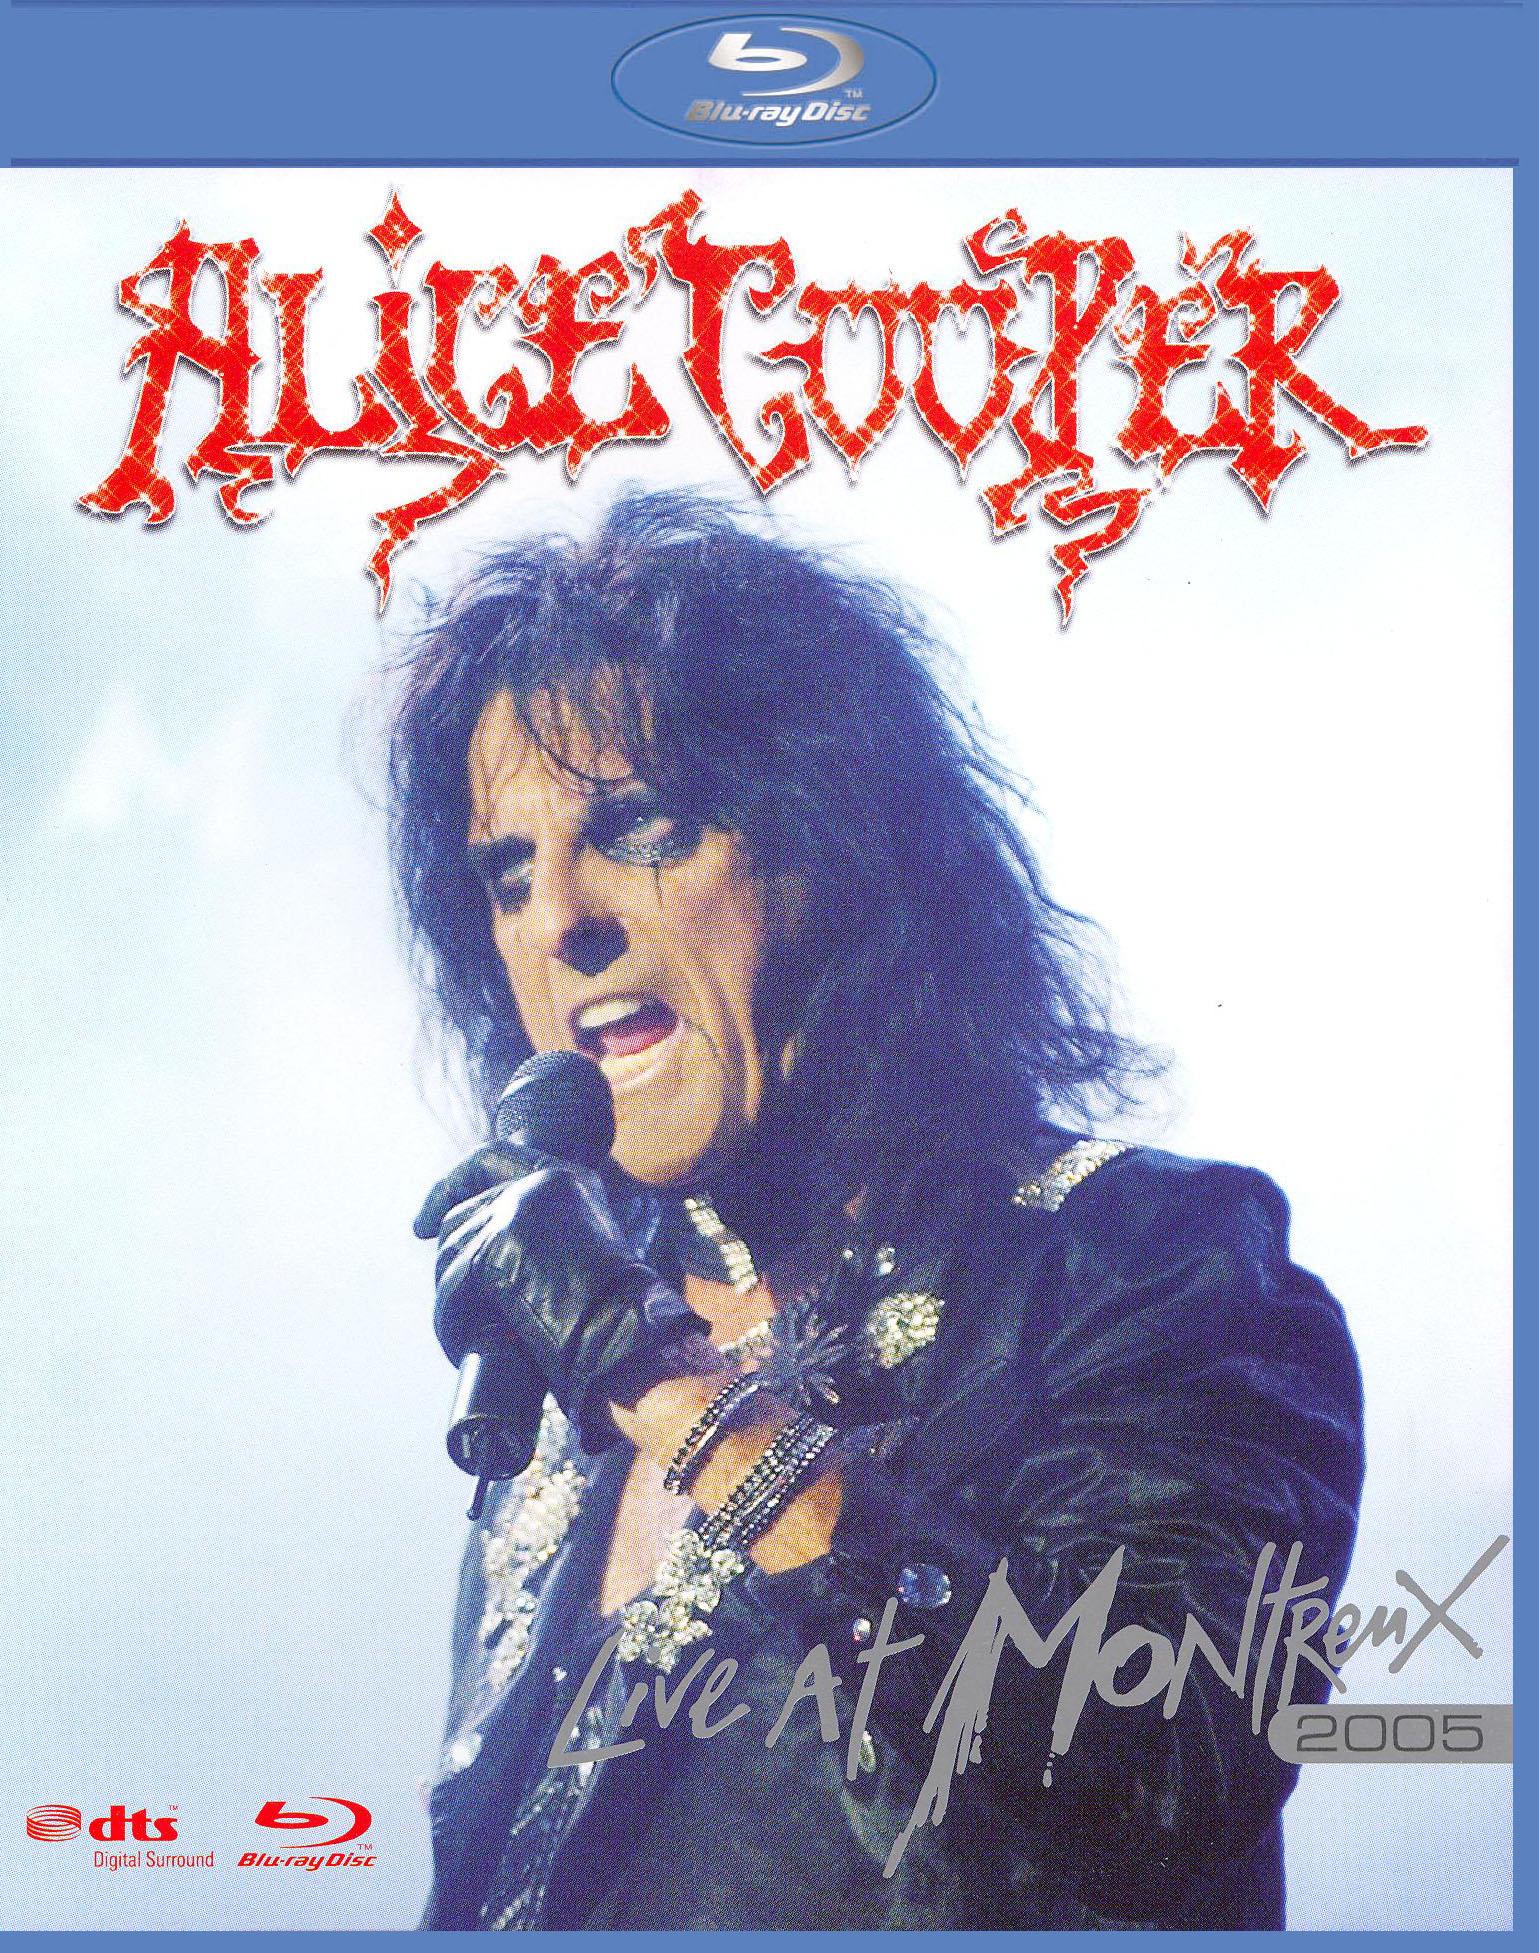 Alice Cooper: Live at Montreux, 2005